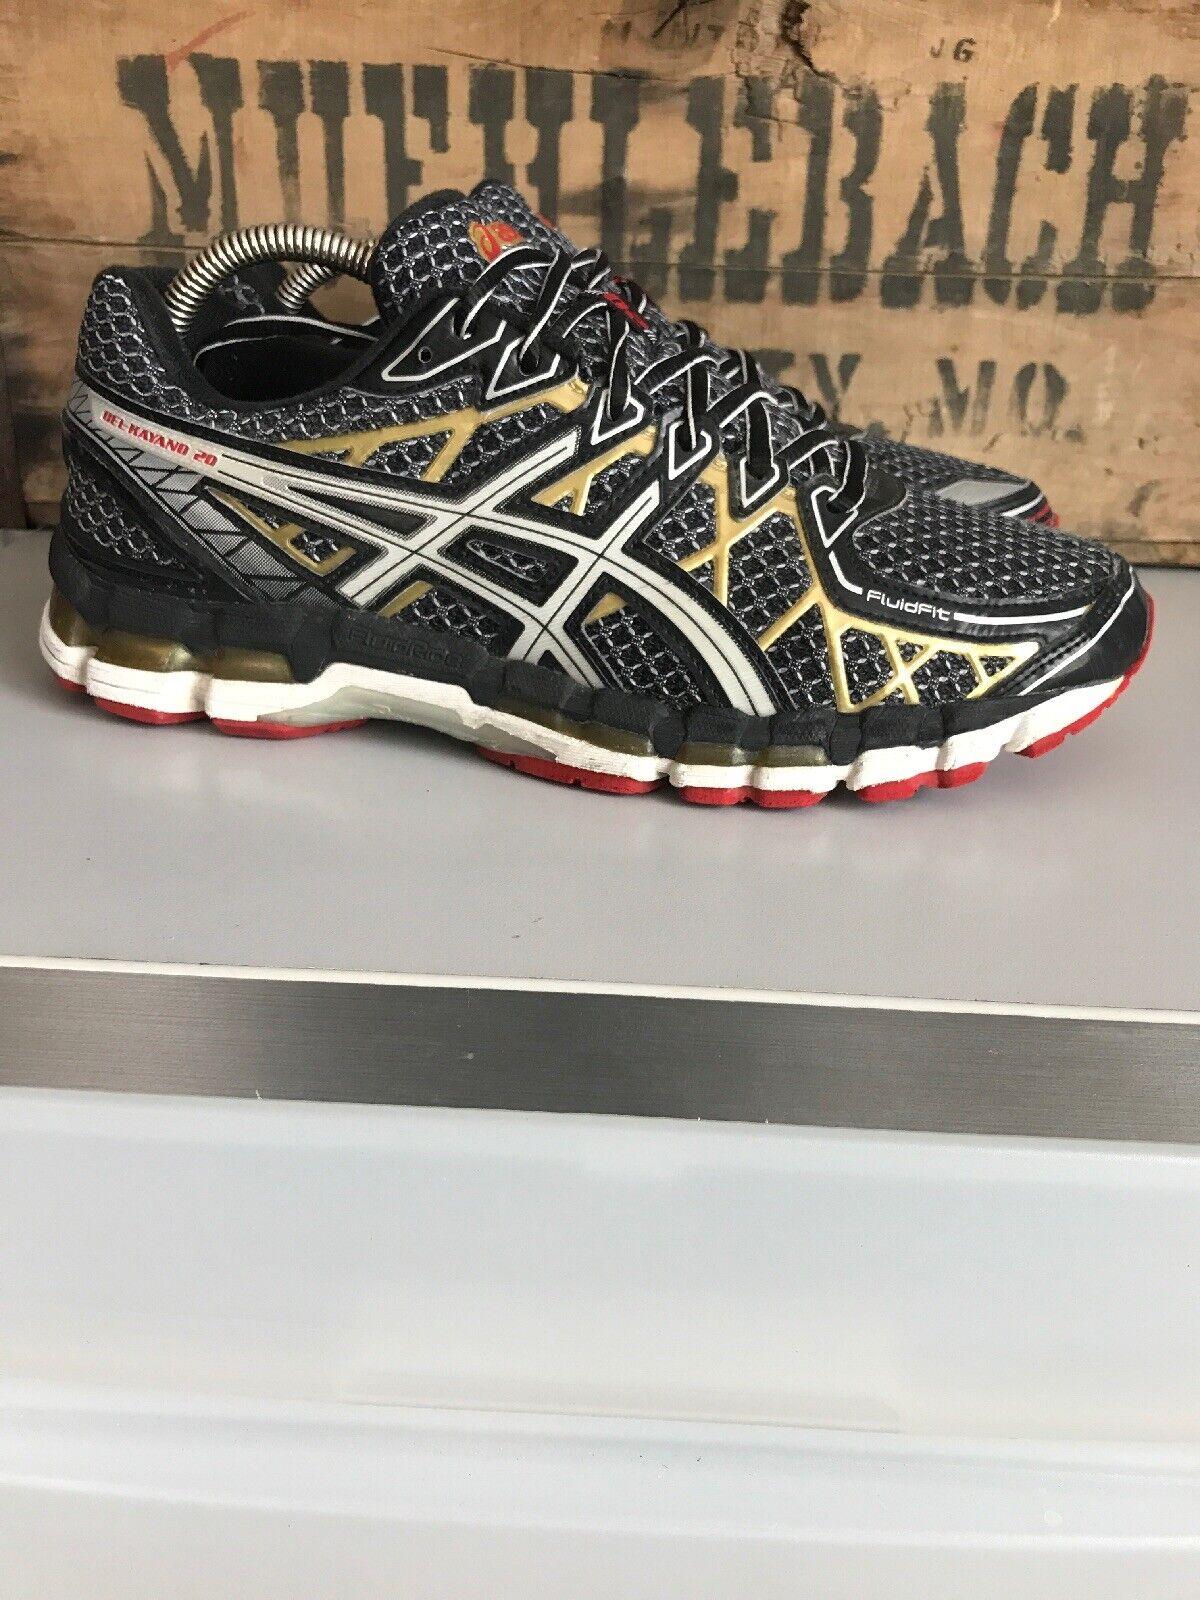 ASICS Gel Kayano 20 Anniversary Zapatillas Para Correr Para hombres T3N4N Negro oro